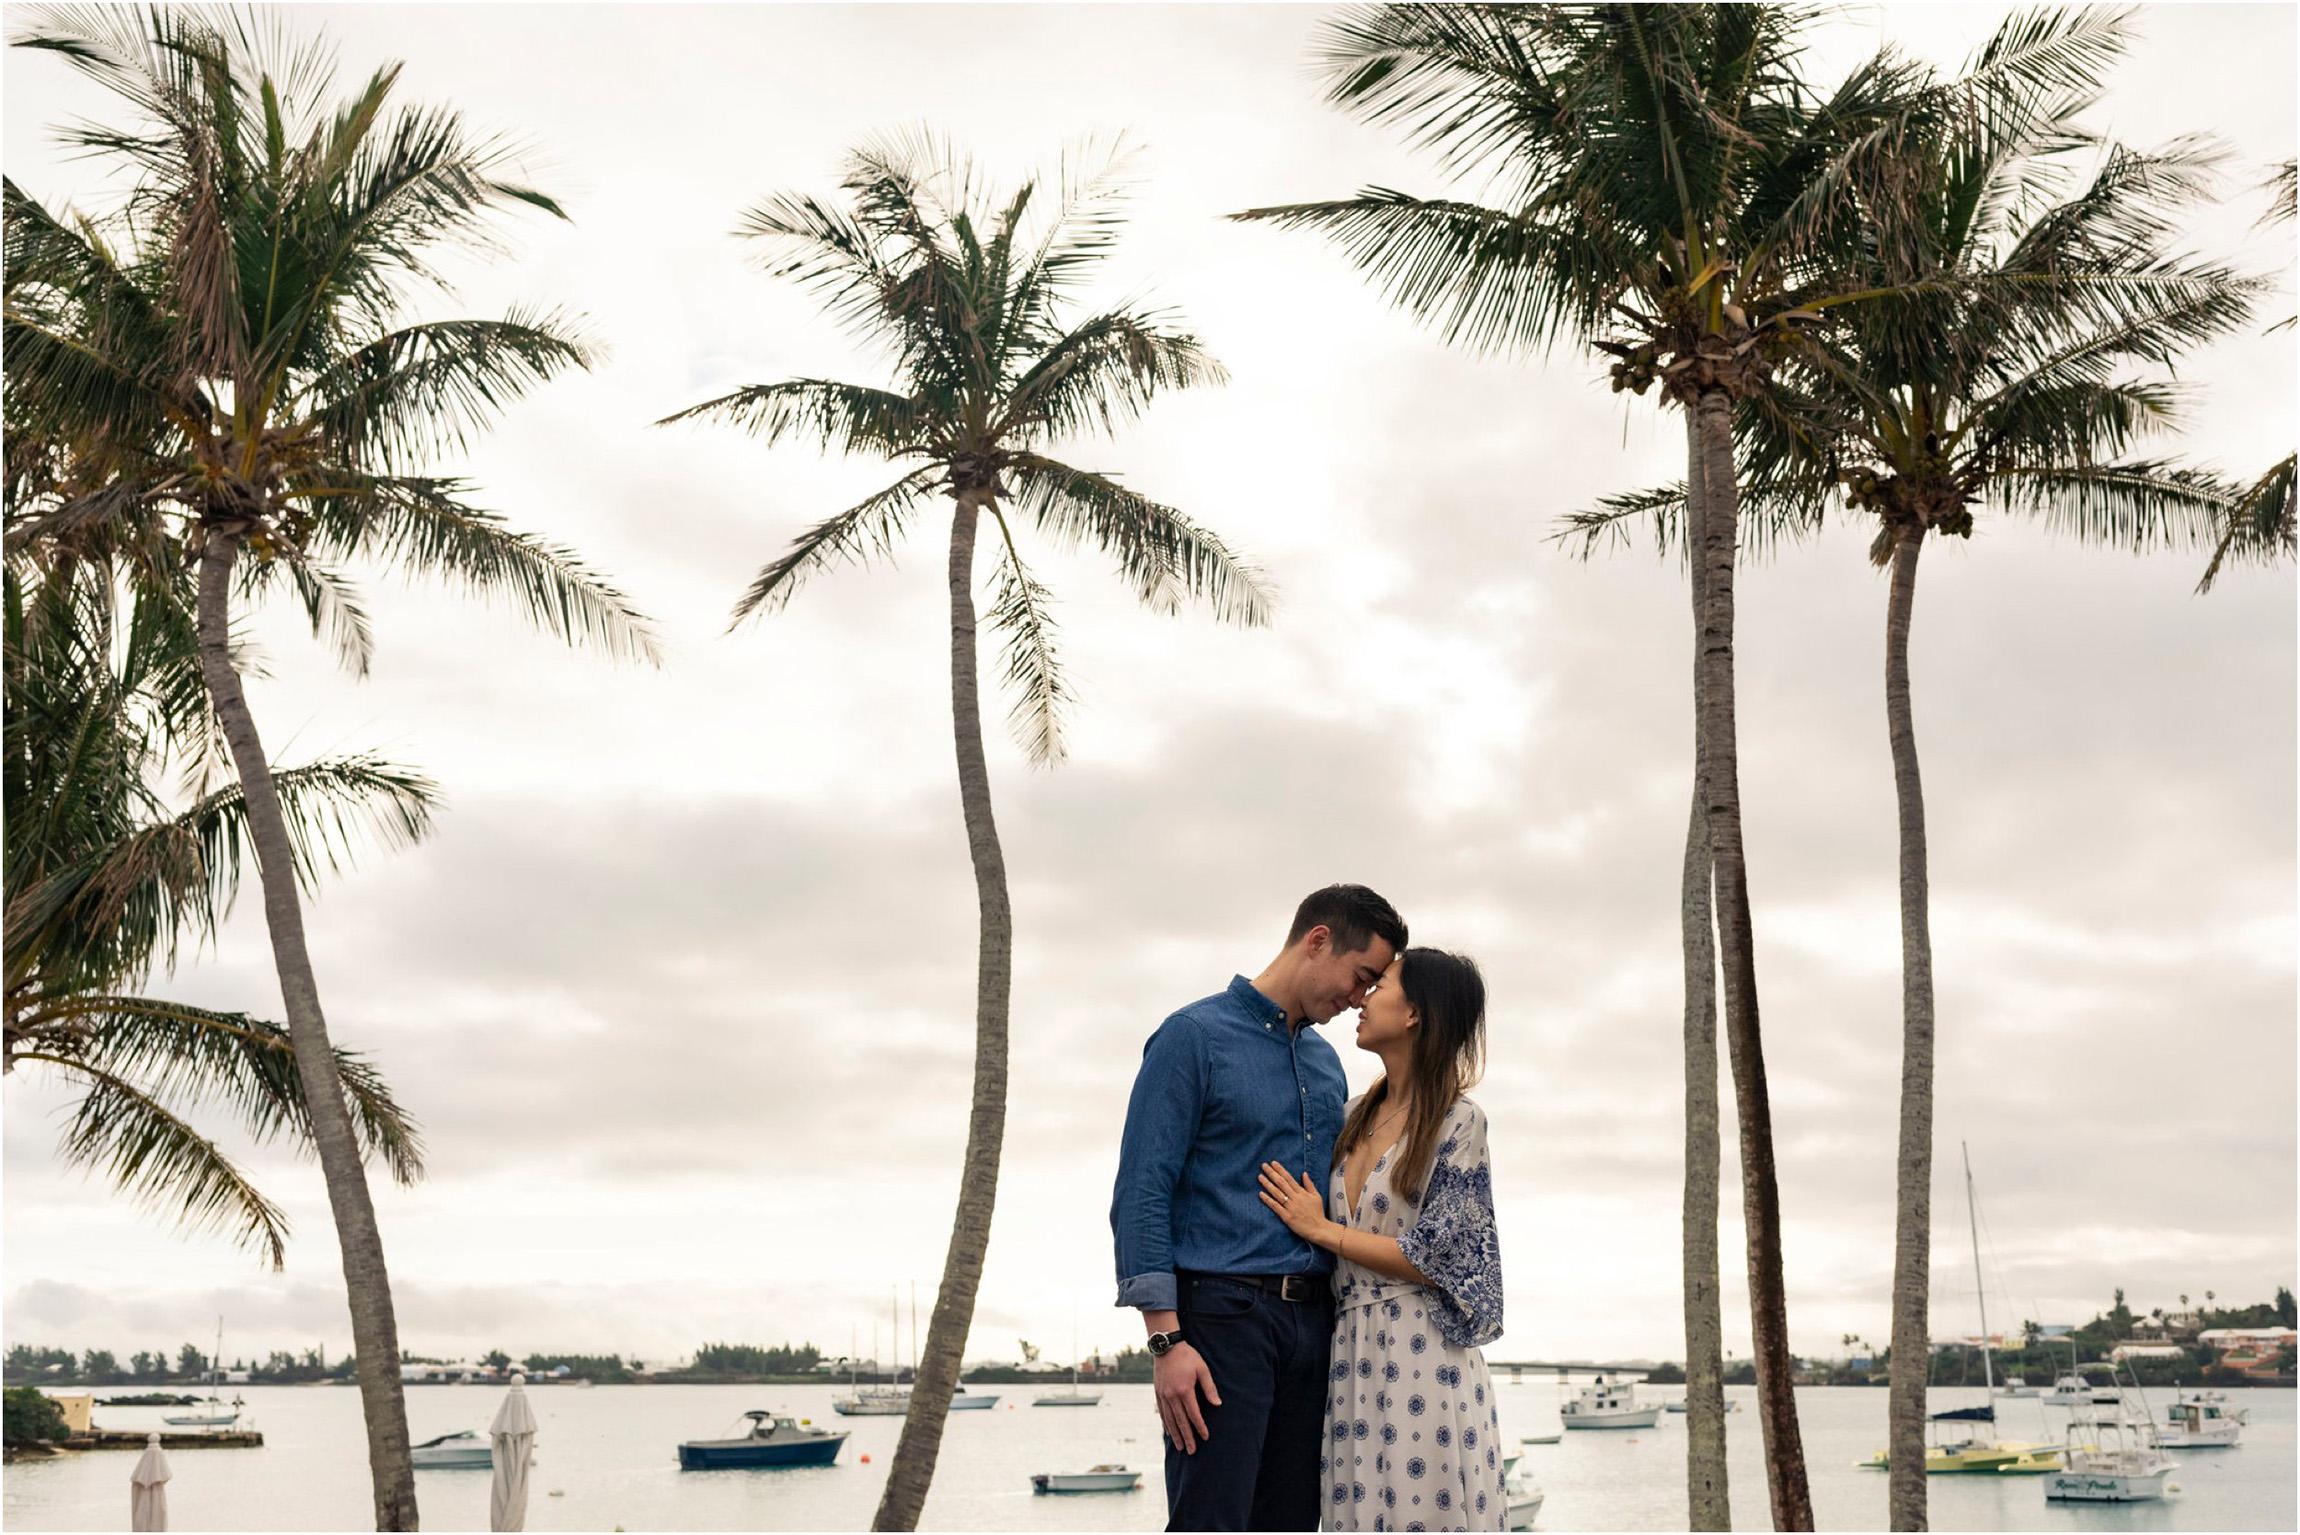 ©FianderFoto_Bermuda Proposal Photographer_Cambridge Beaches_Mason_023.jpg